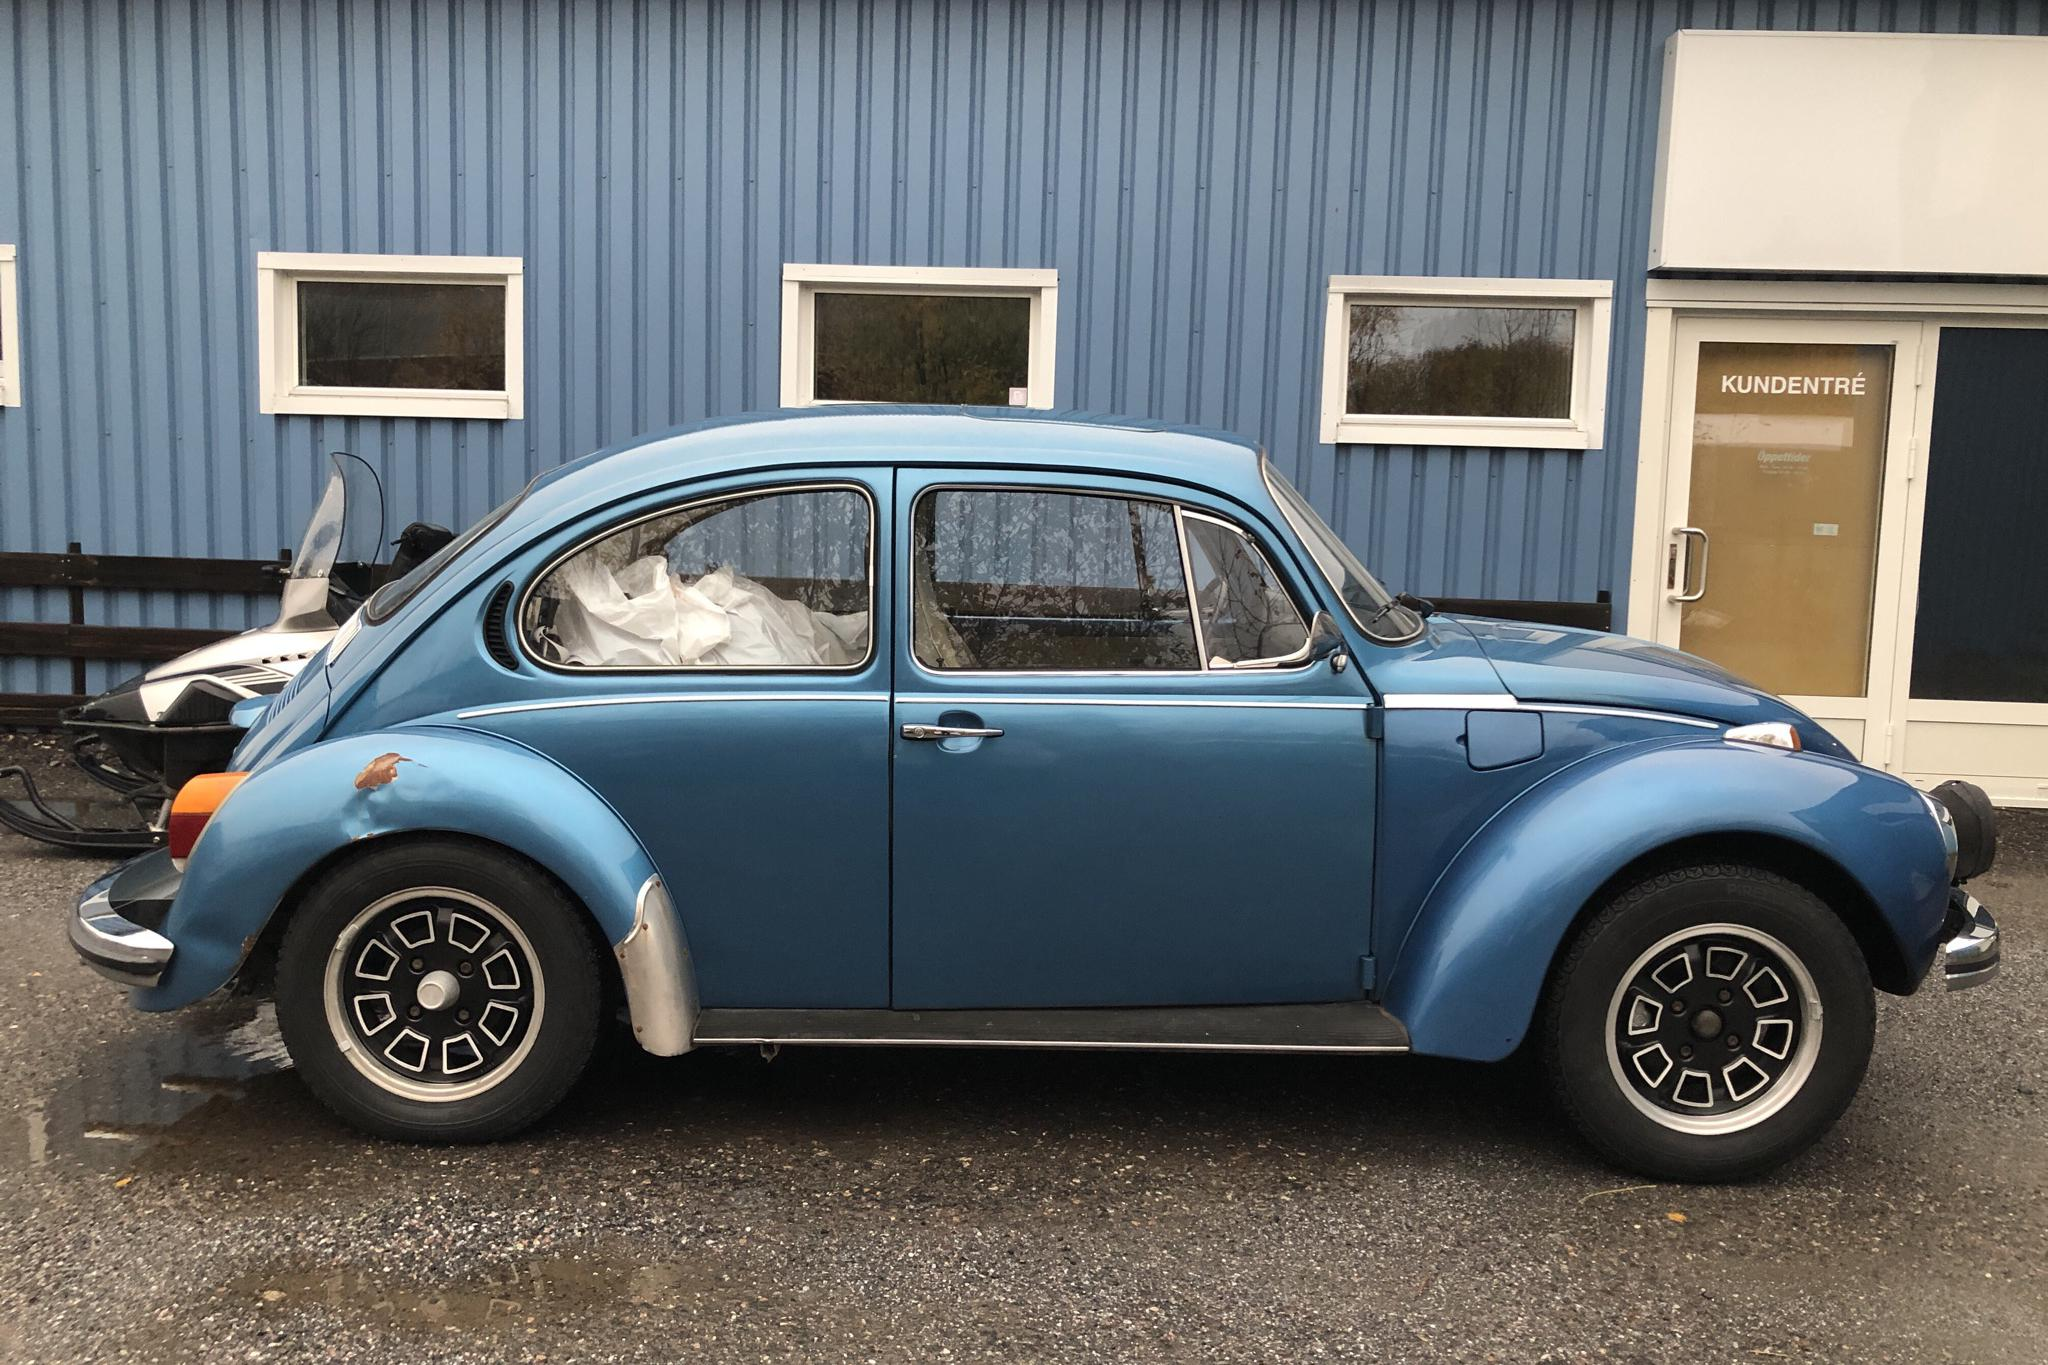 VW 1303 S (50hk) Bubbla - 62 520 km - Manual - blue - 1973